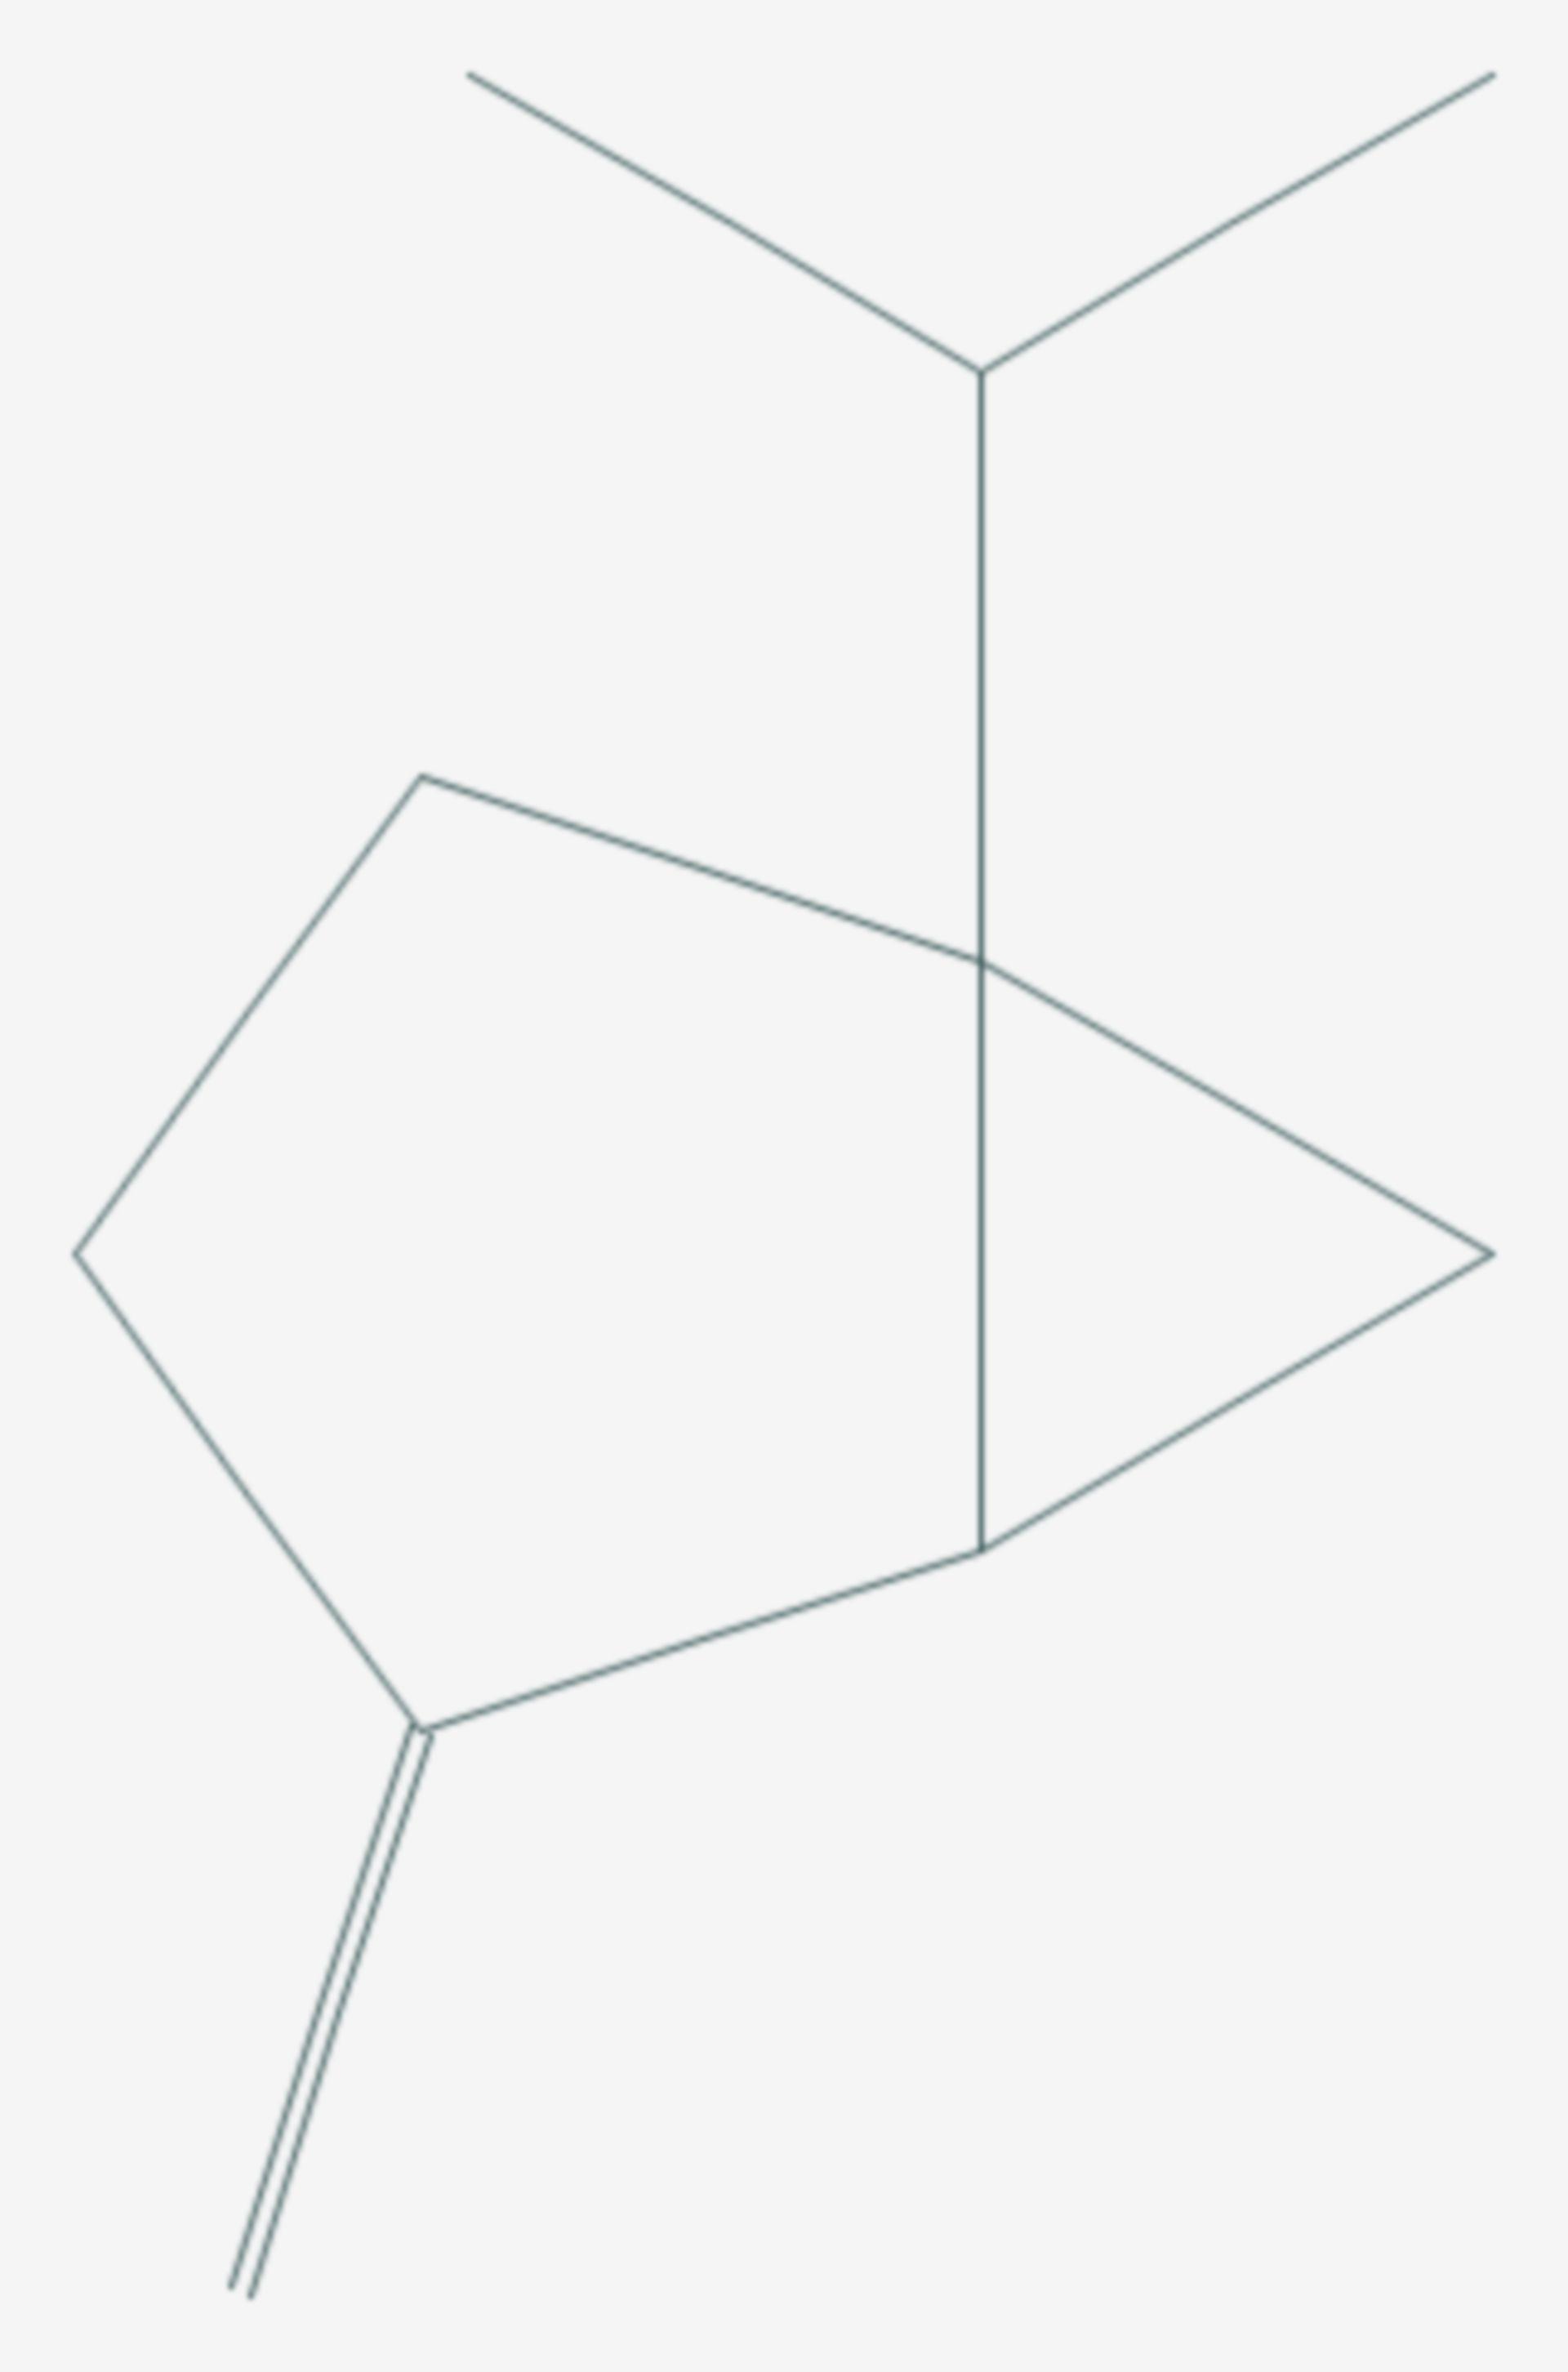 Sabinen (Strukturformel)